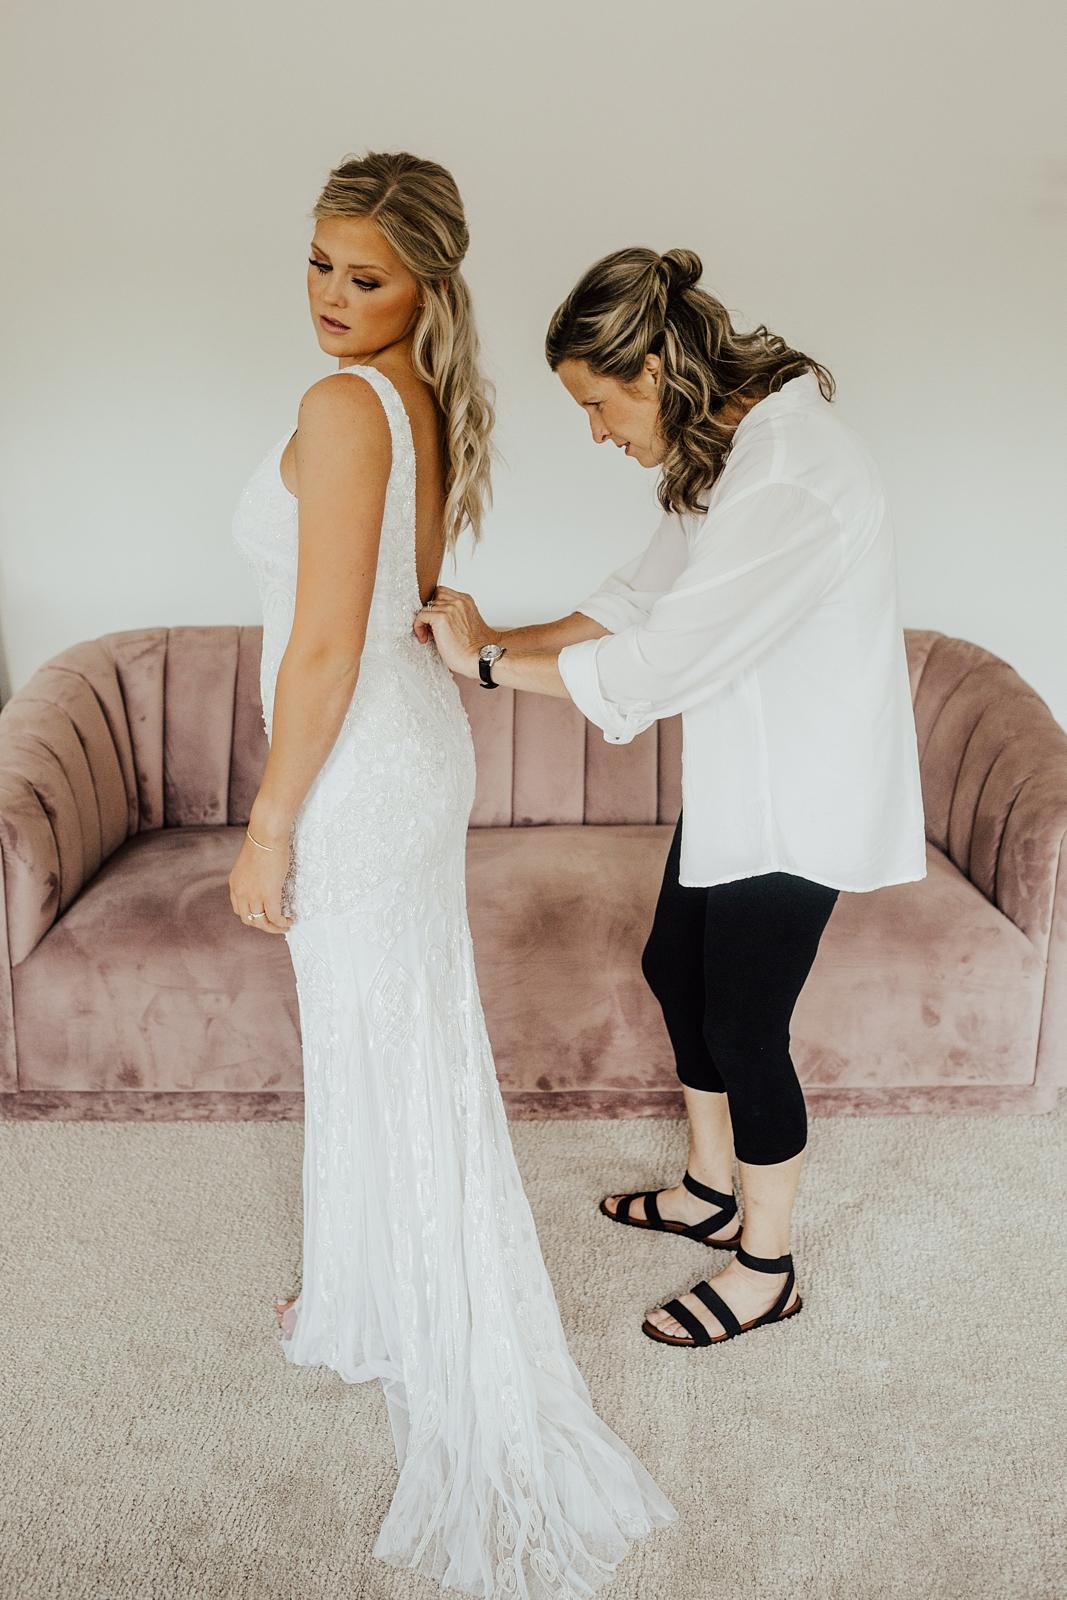 Anna & Trey Modern Minneapolis Wedding at The Hutton House_0686.jpg